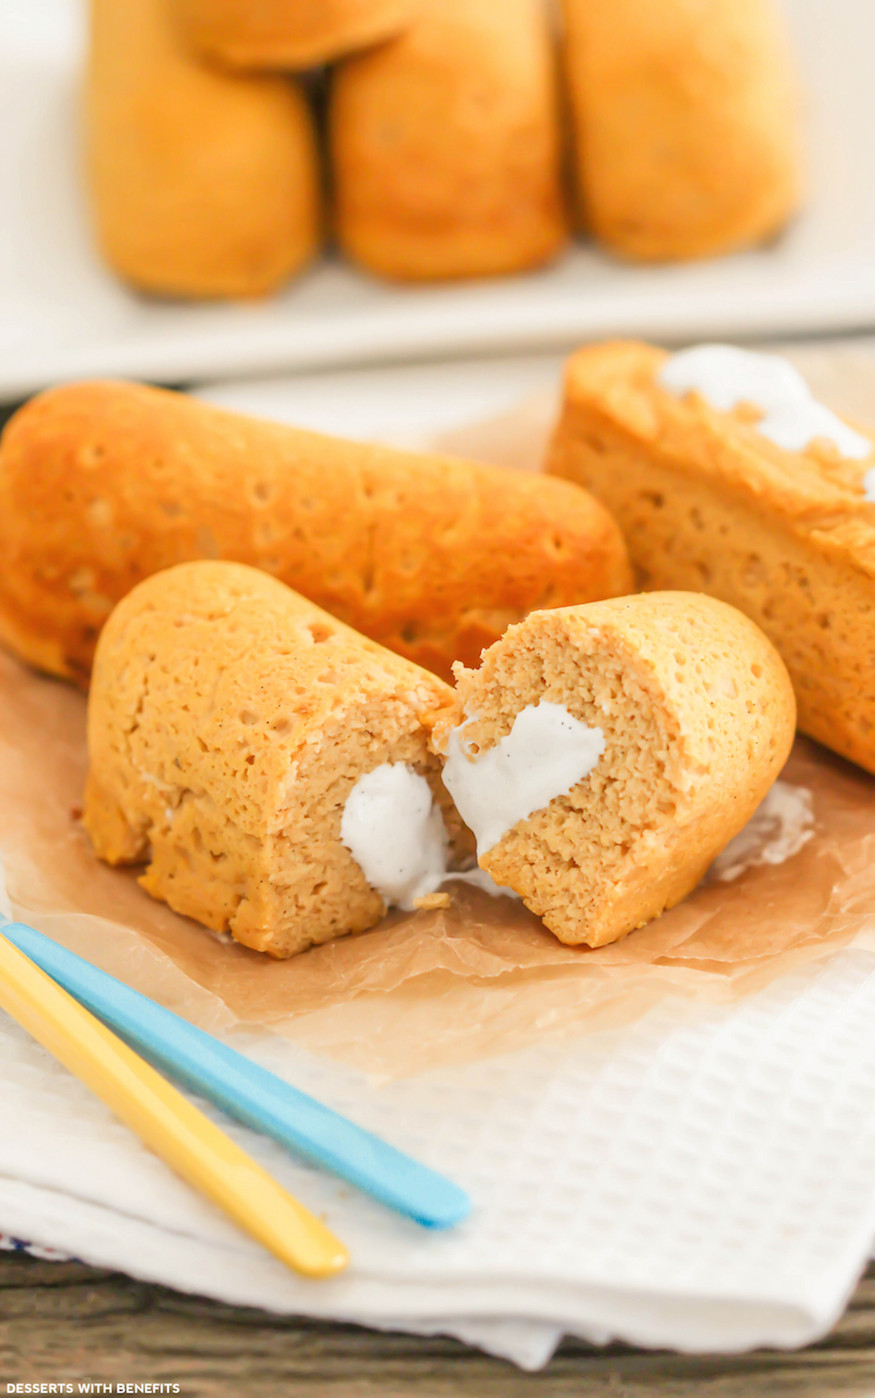 Low Fat Sugar Free Desserts  Healthy Homemade Twinkies sugar free low fat gluten free